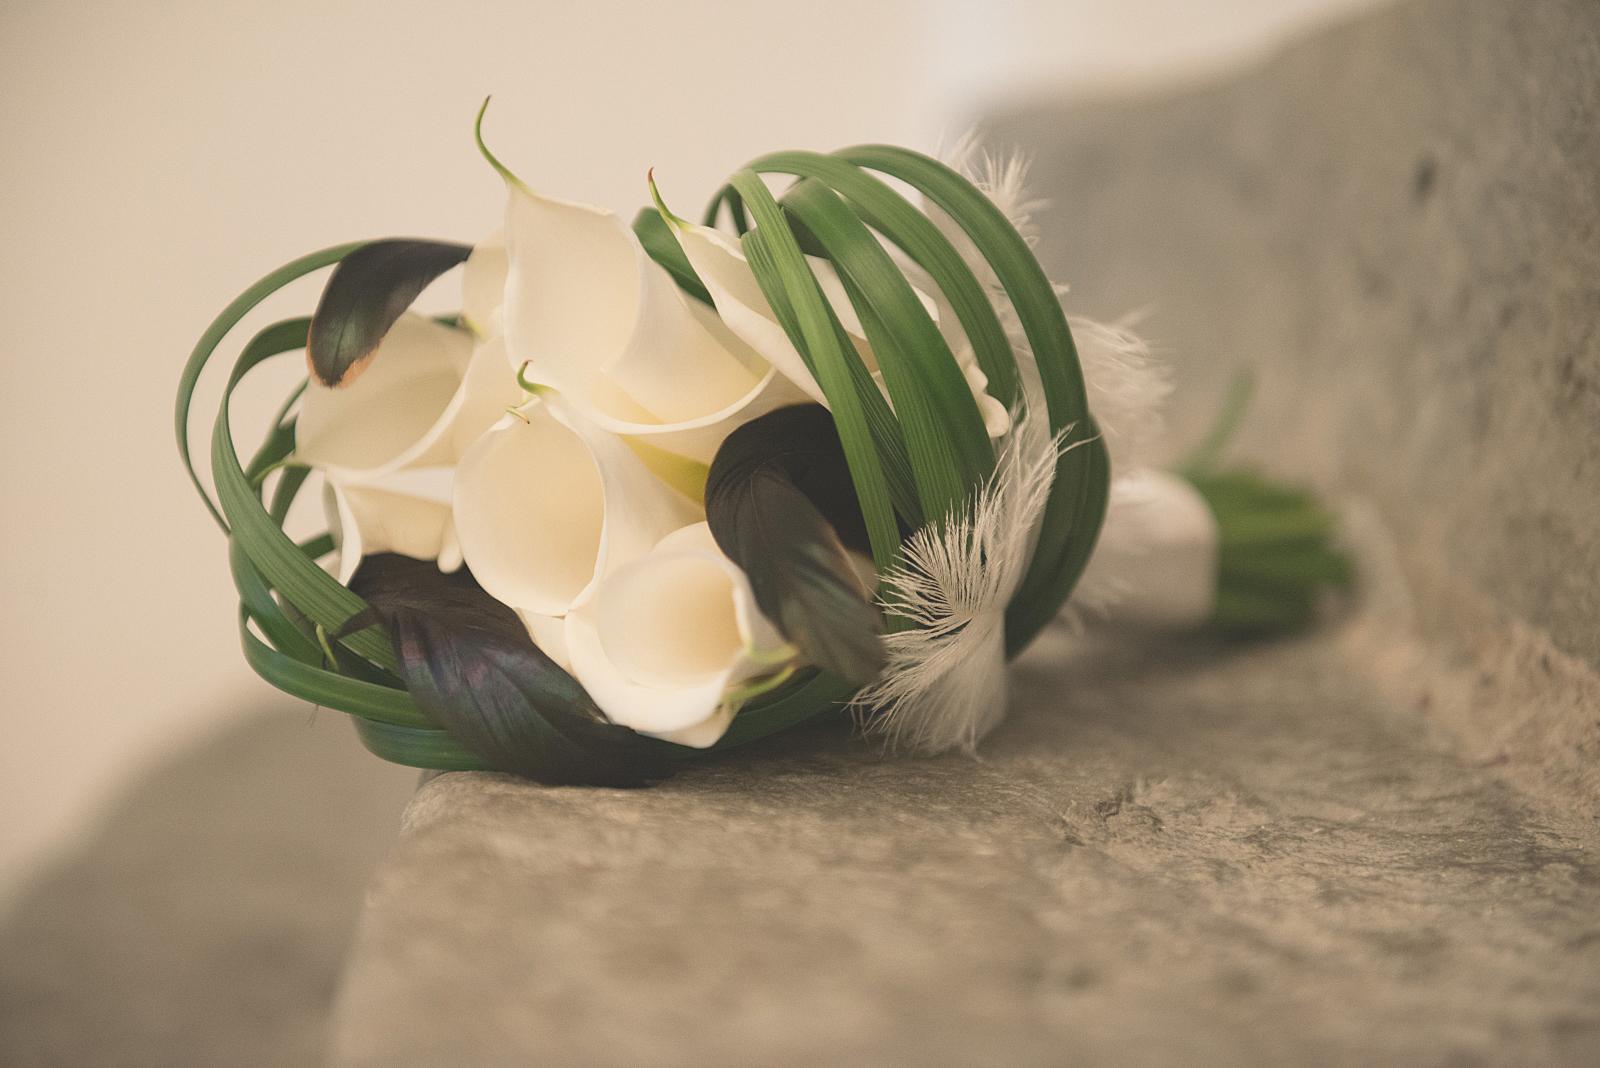 matrimonio civile zurigo-matrimonio zurigo-fotografo zurigo-fotografo